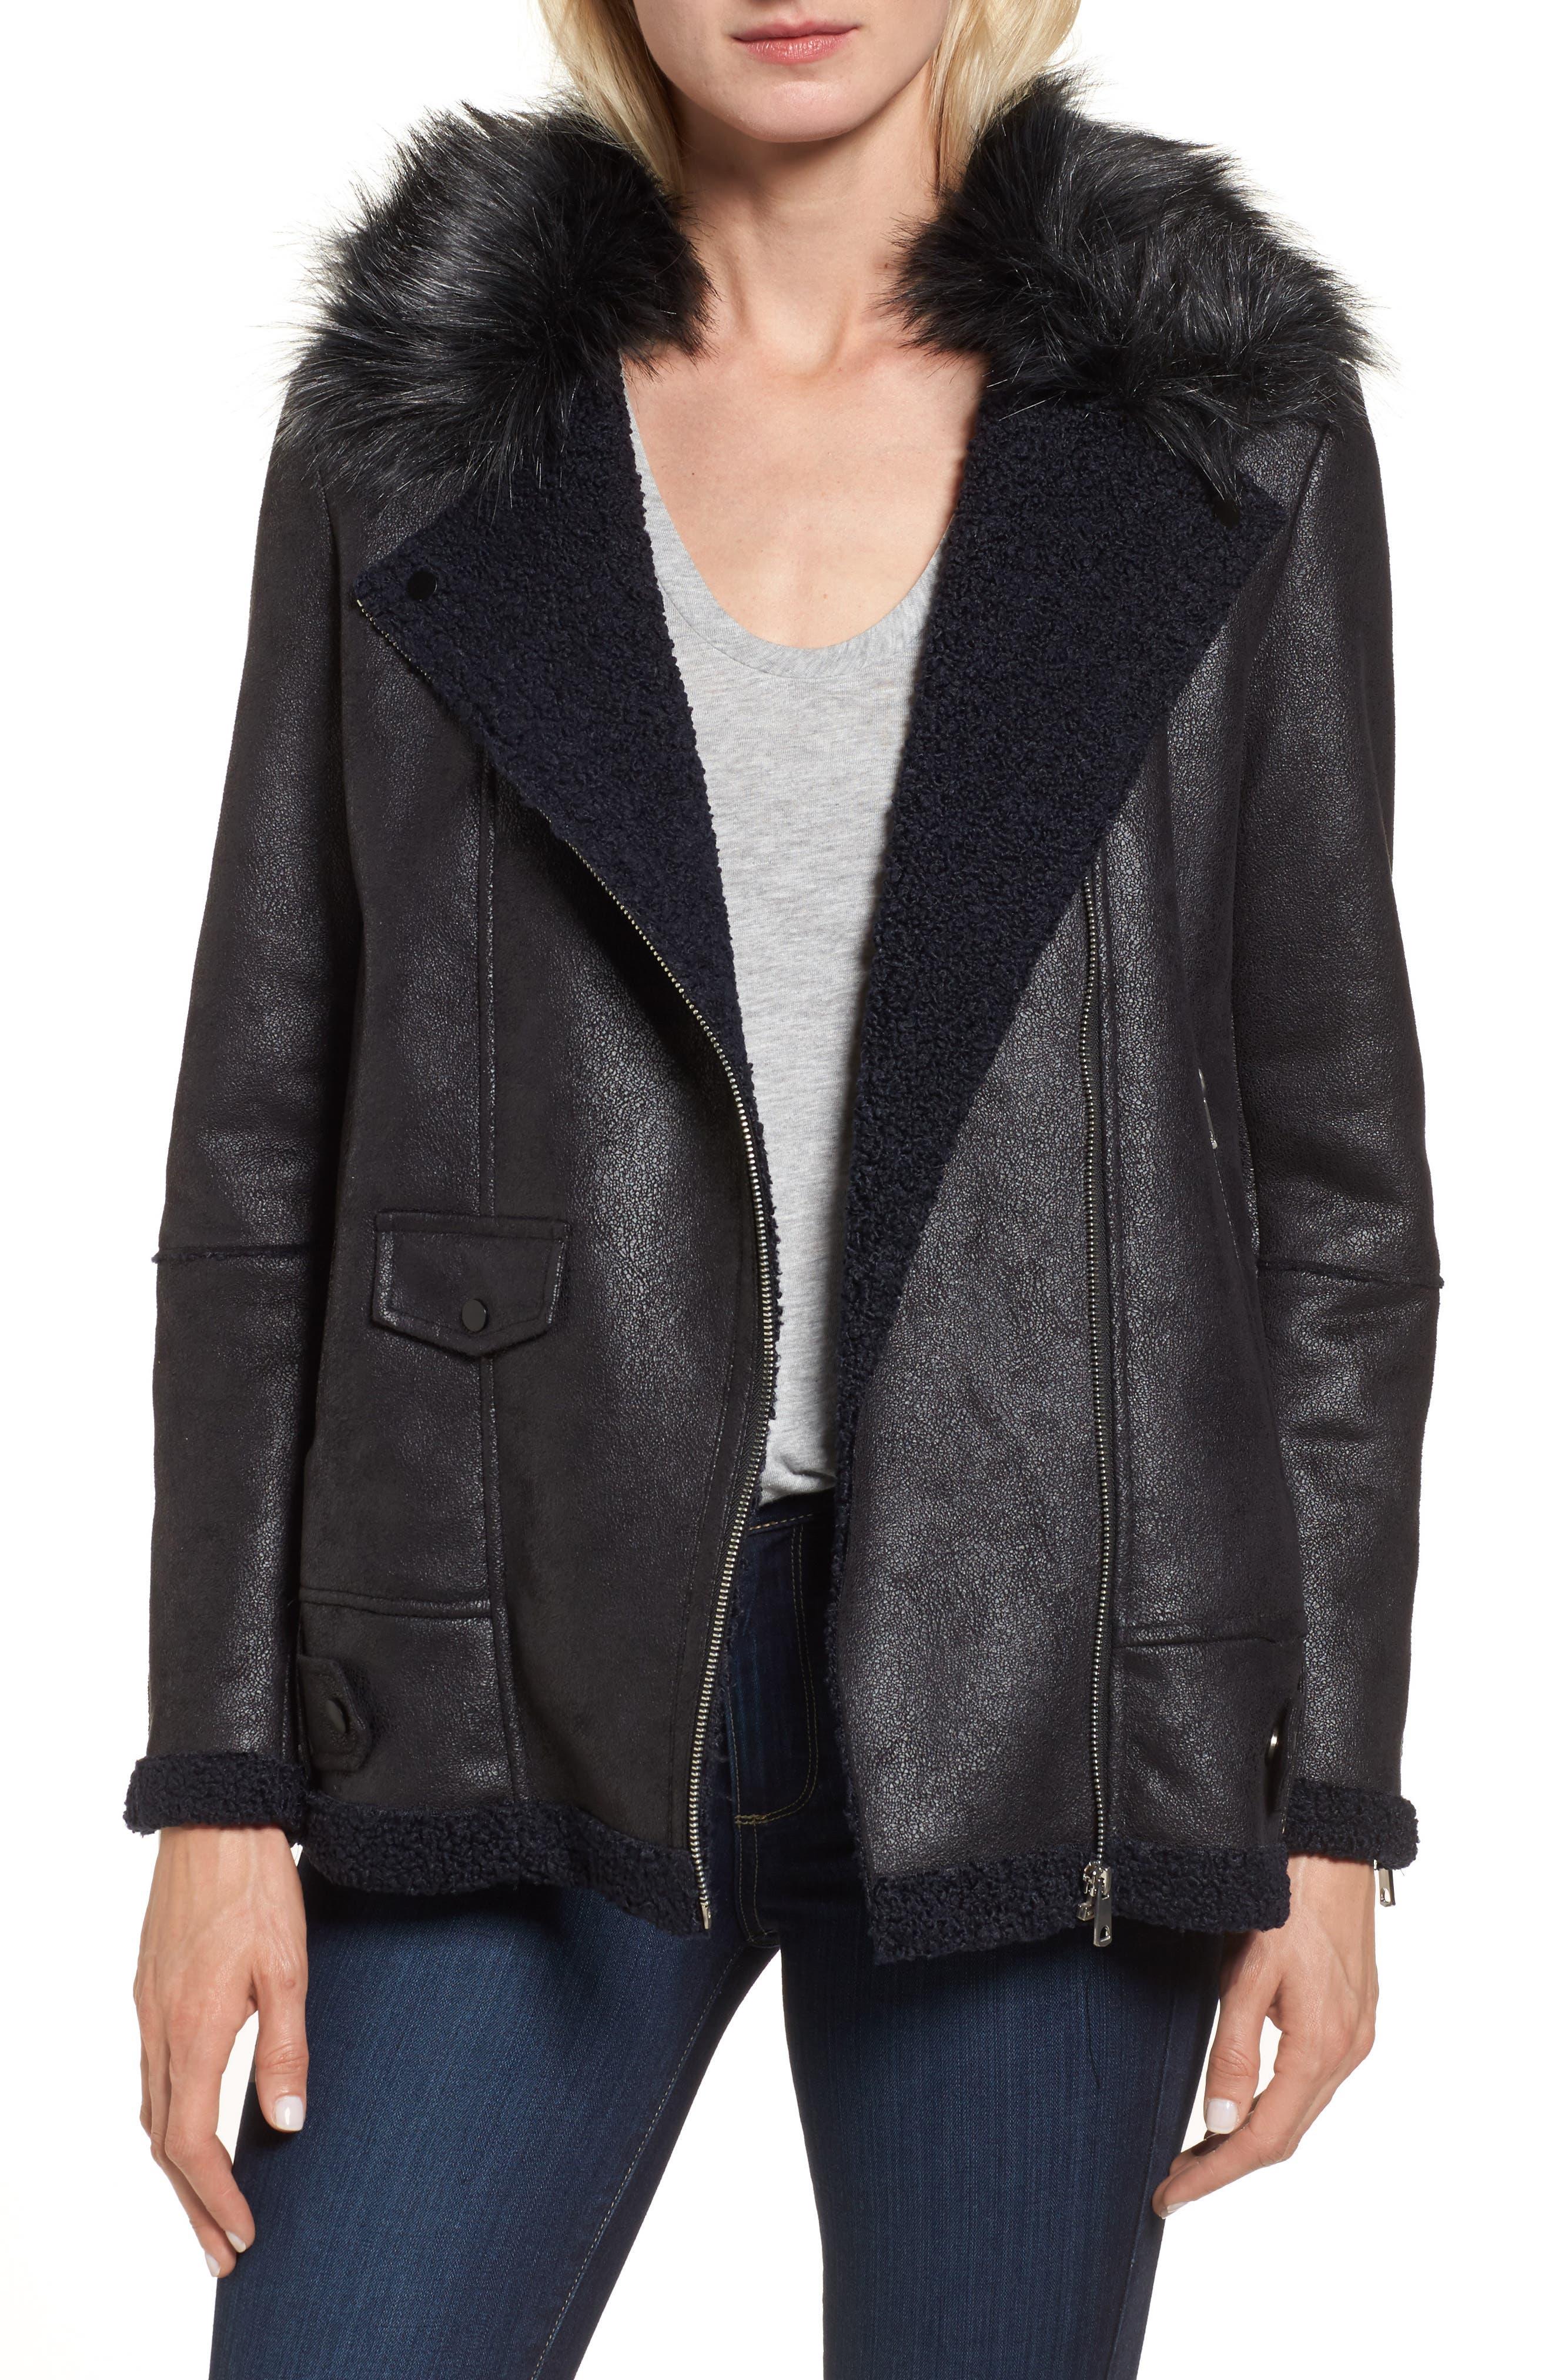 Faux Suede Moto Jacket with Faux Fur Collar,                         Main,                         color, Black/ Navy